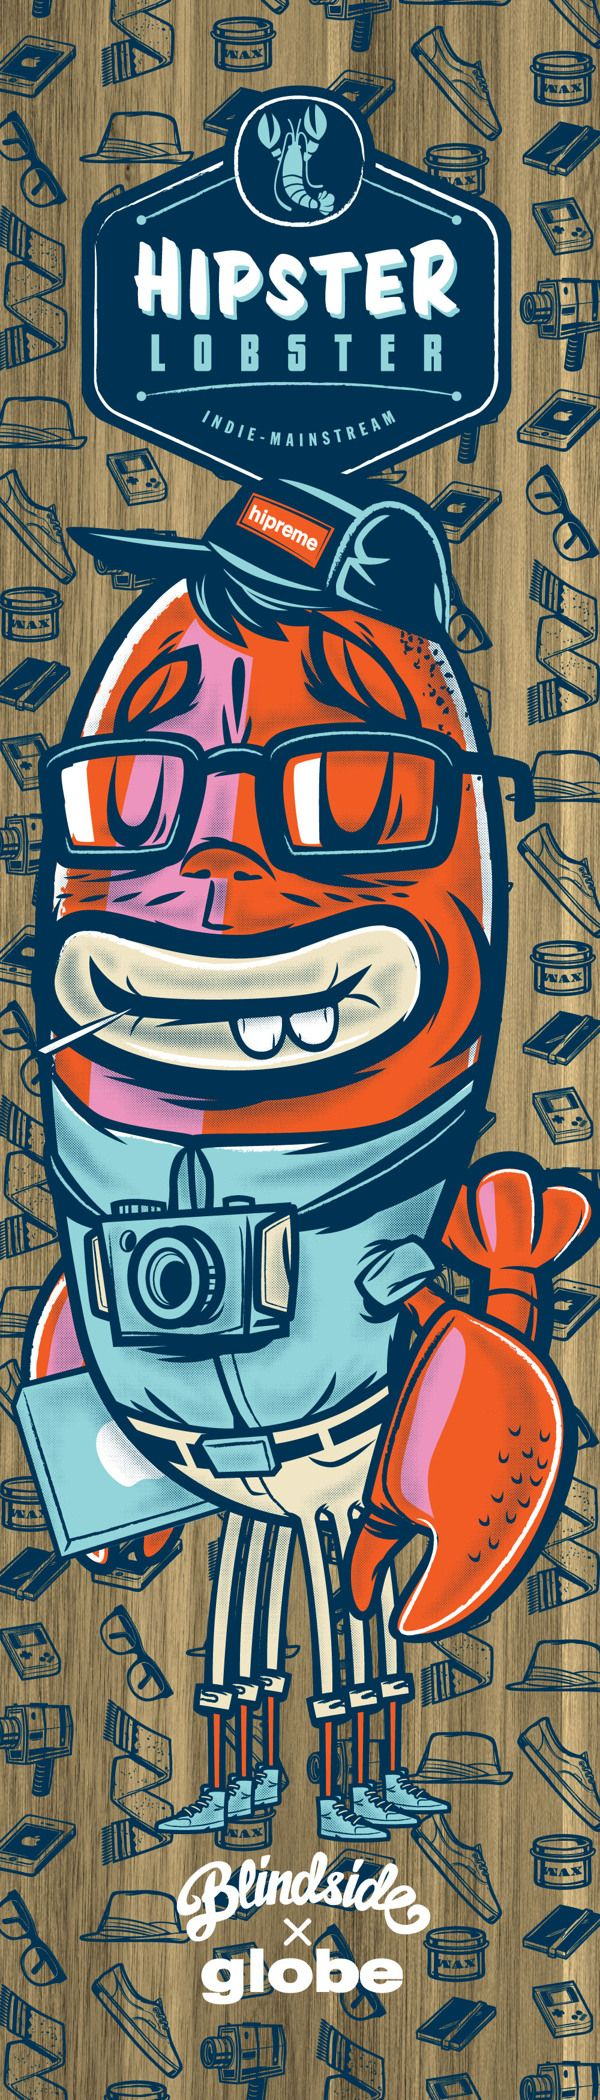 Hipster Lobster Skateboard by Travis Price, via Behance